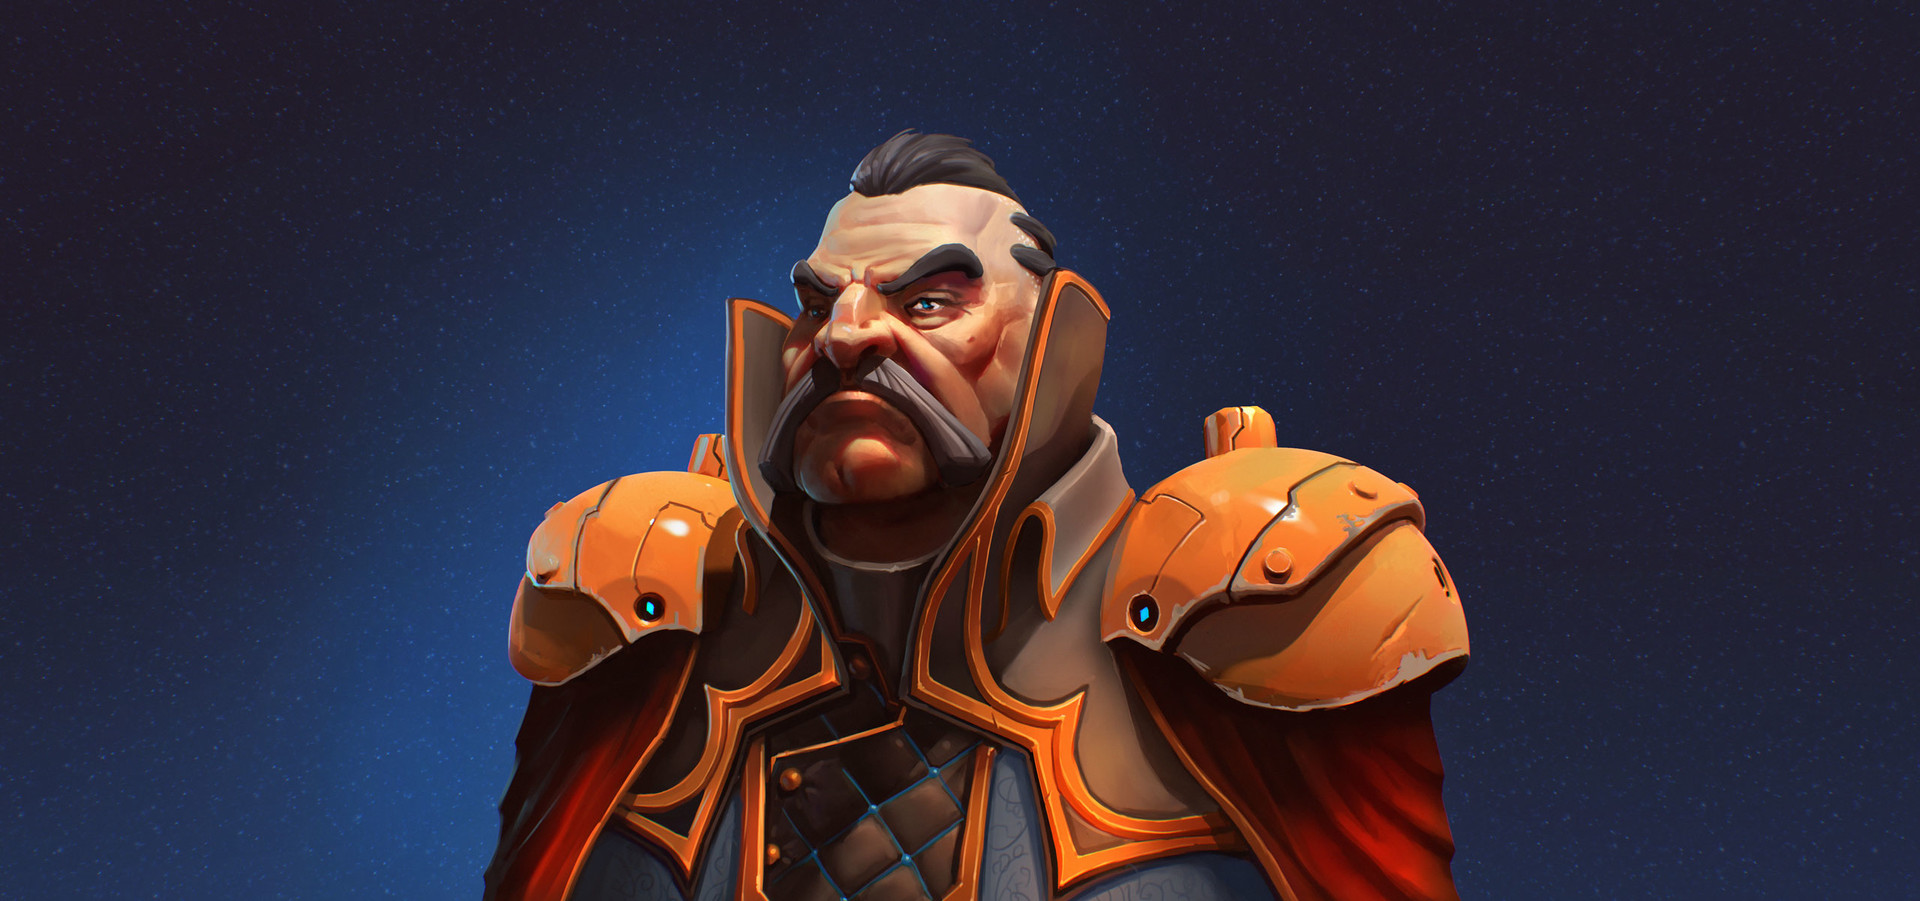 Maxence burgel captain01